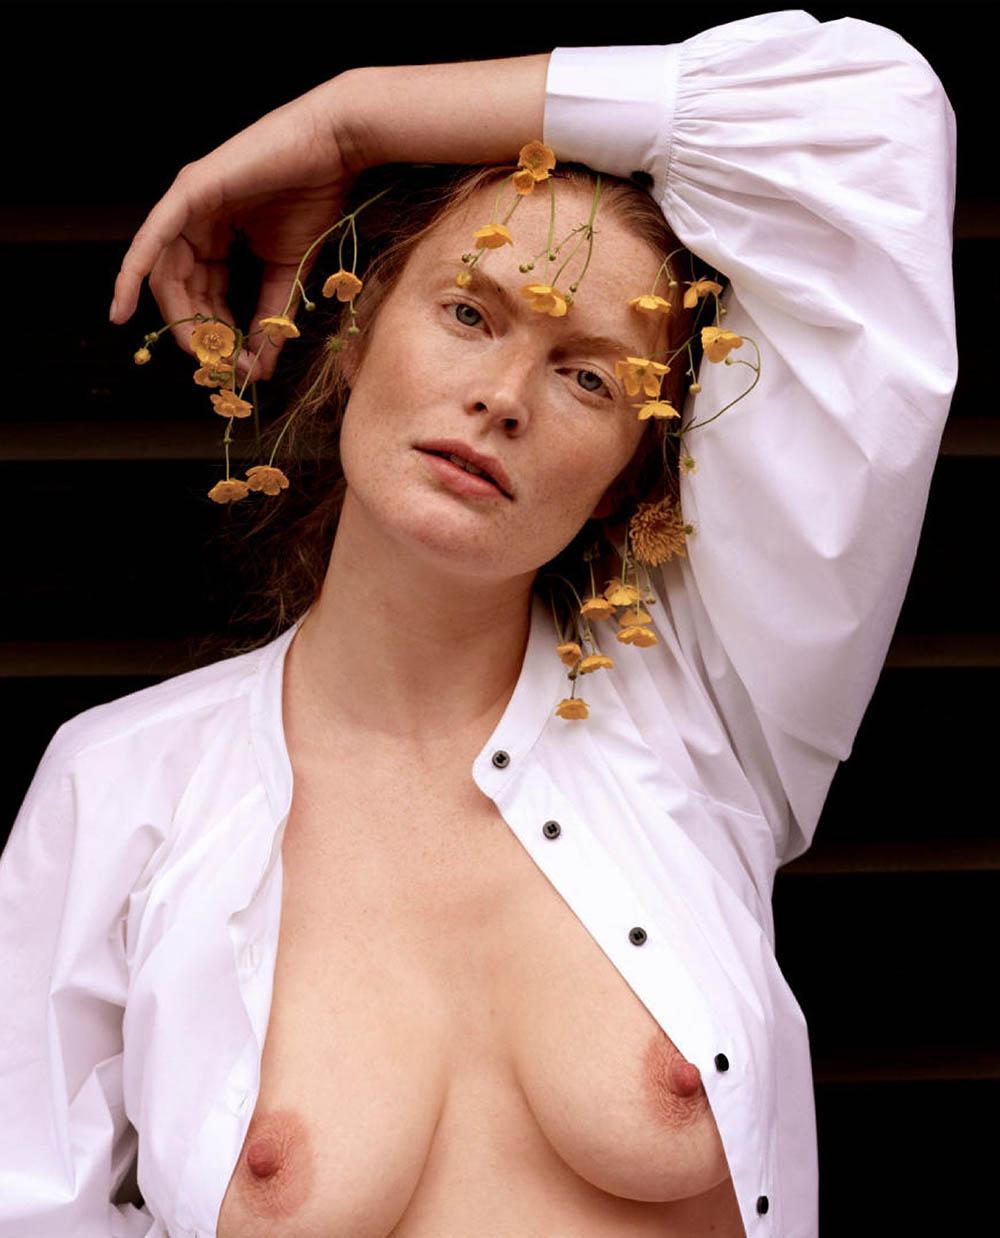 Marte Boneschansker by Paul Bellaart for Vogue Netherlands July August 2019